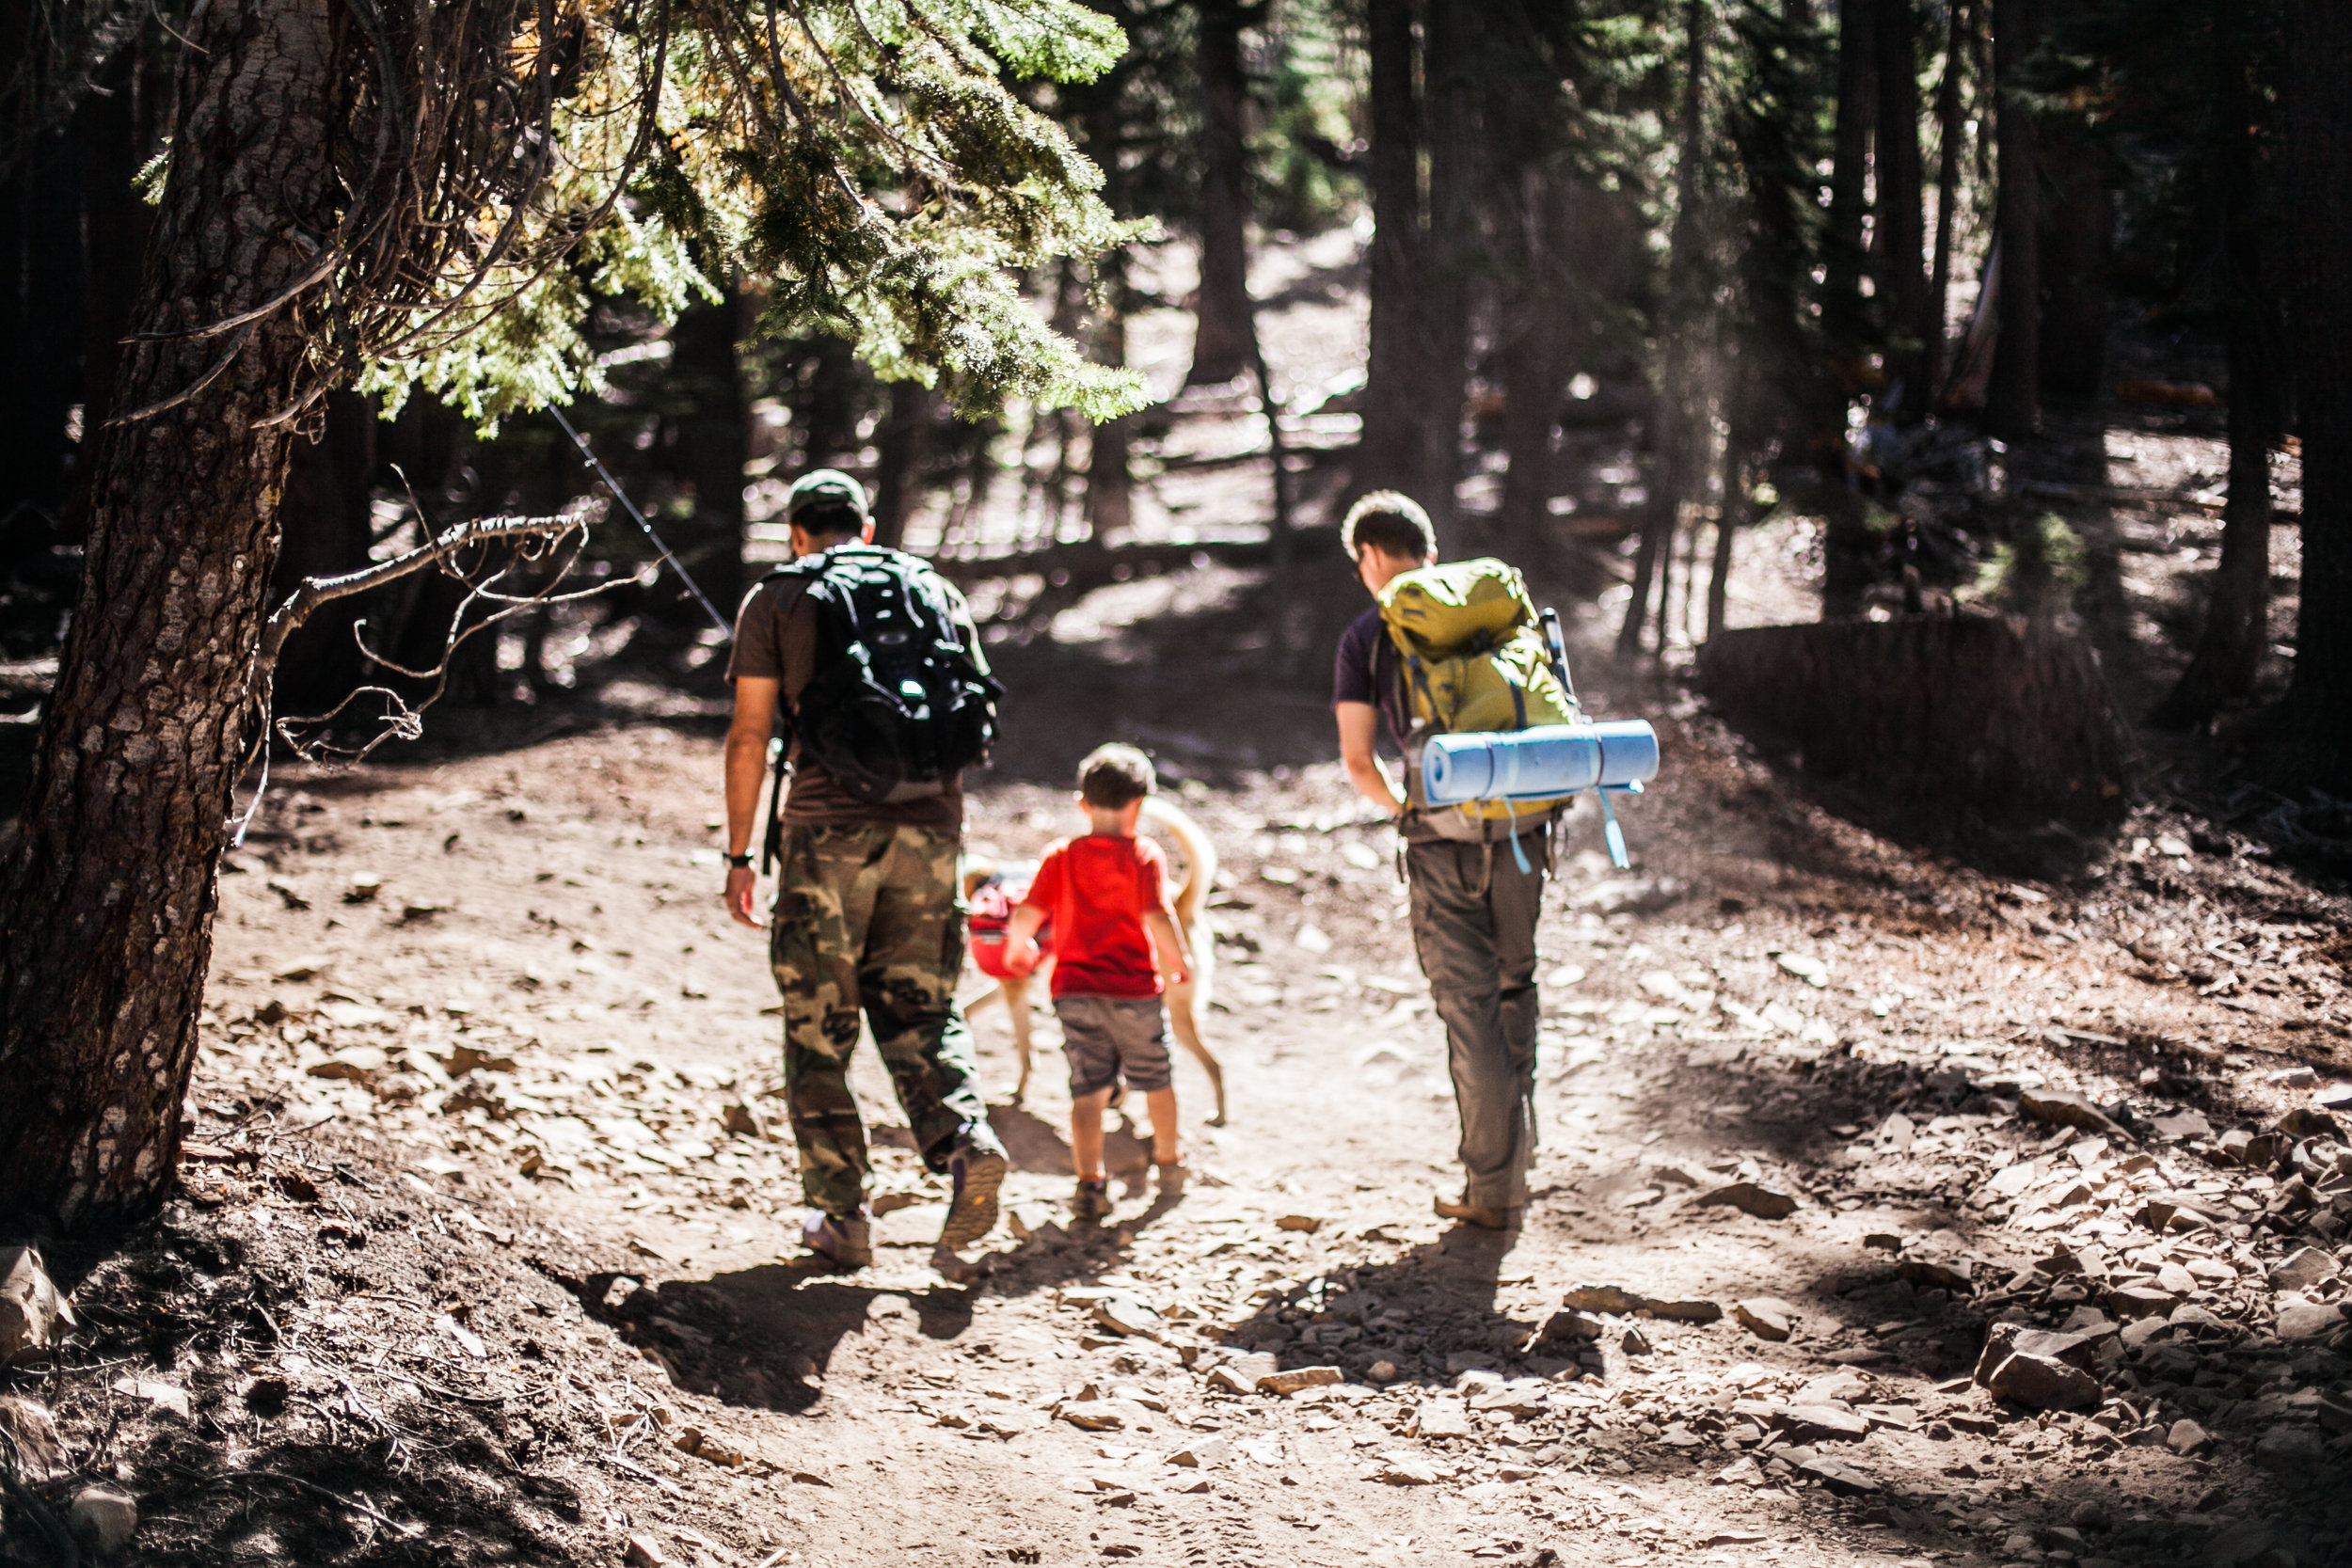 Sierra-Vista-Scenic-Byway-Madera-County-hiking-Iron-Lakes-Annie-Starkey-photography.jpg